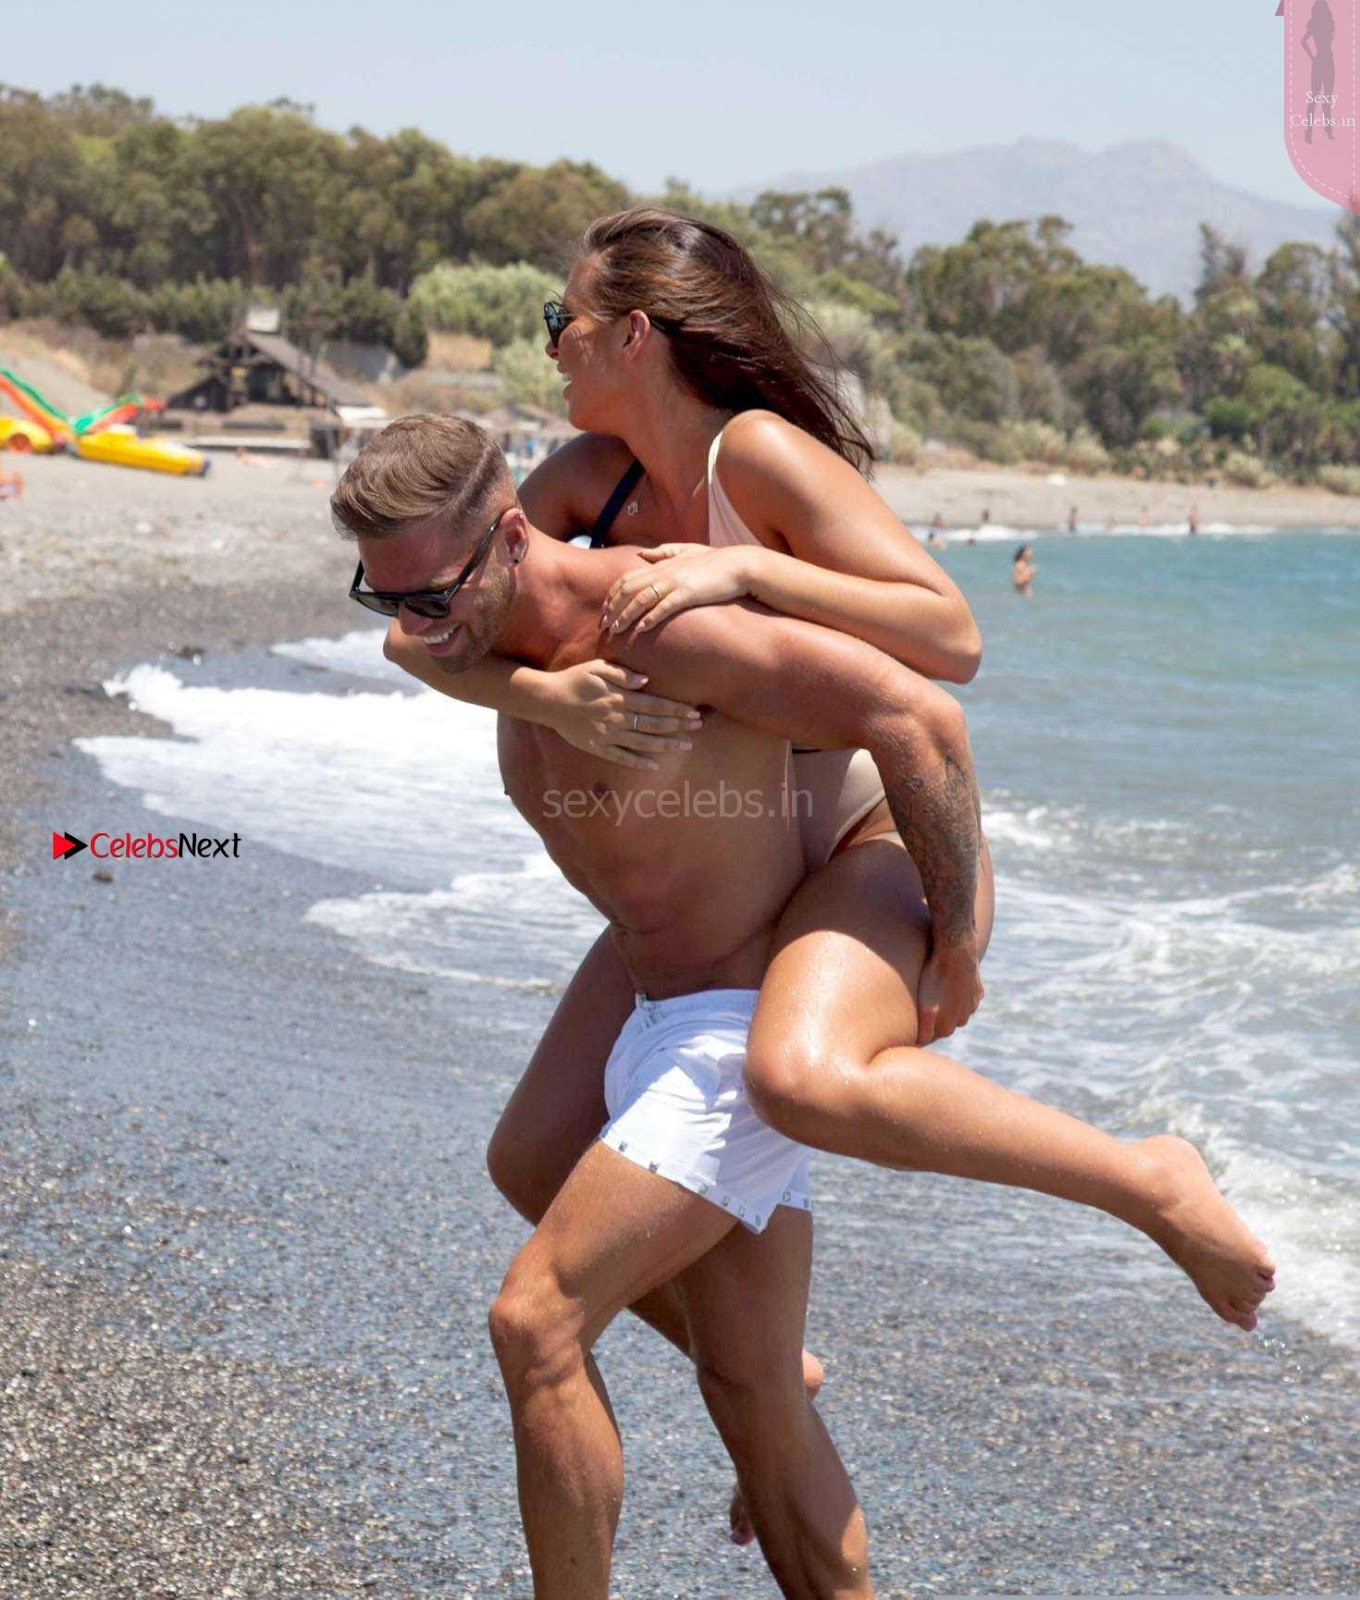 Jessica Sheers busty babe in bikini having sex with her boy friend in bikini on beach wow August 2017